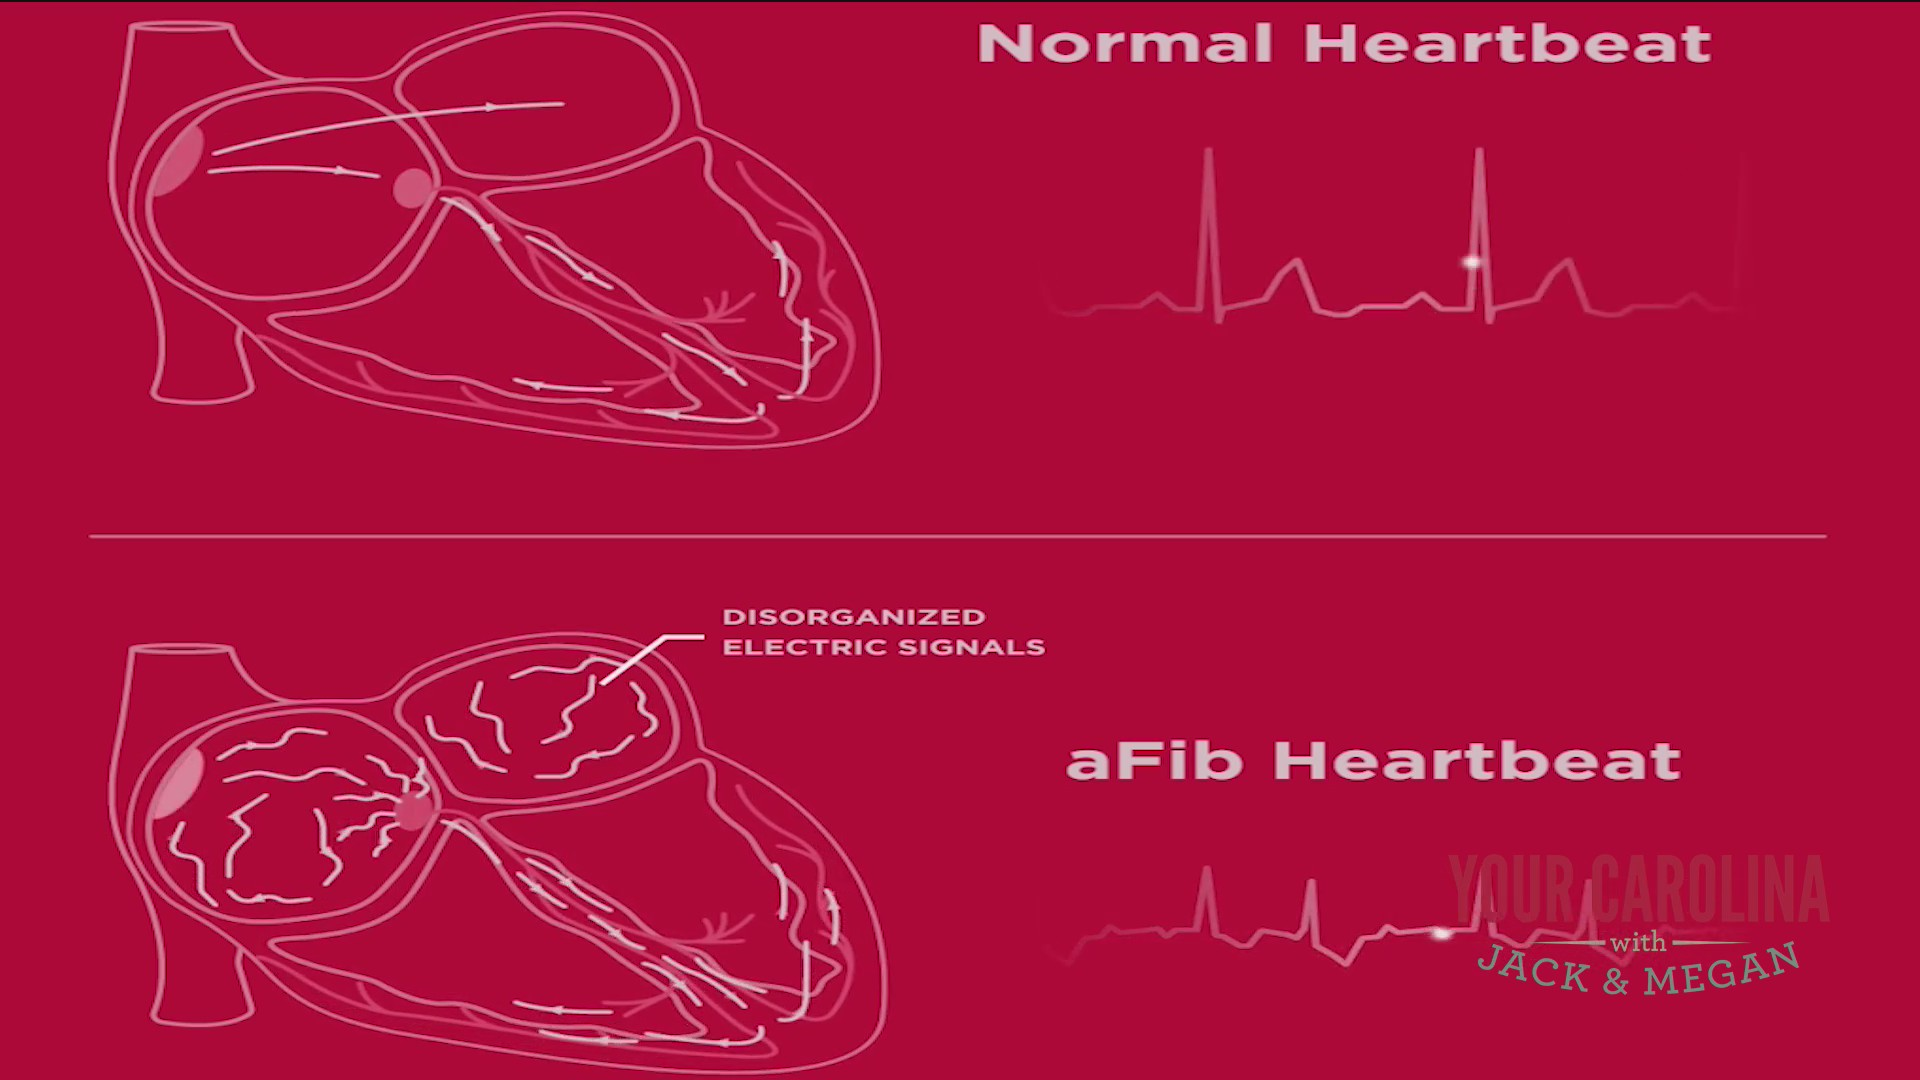 Bon Secours Upstate Cardiology - A.Fib